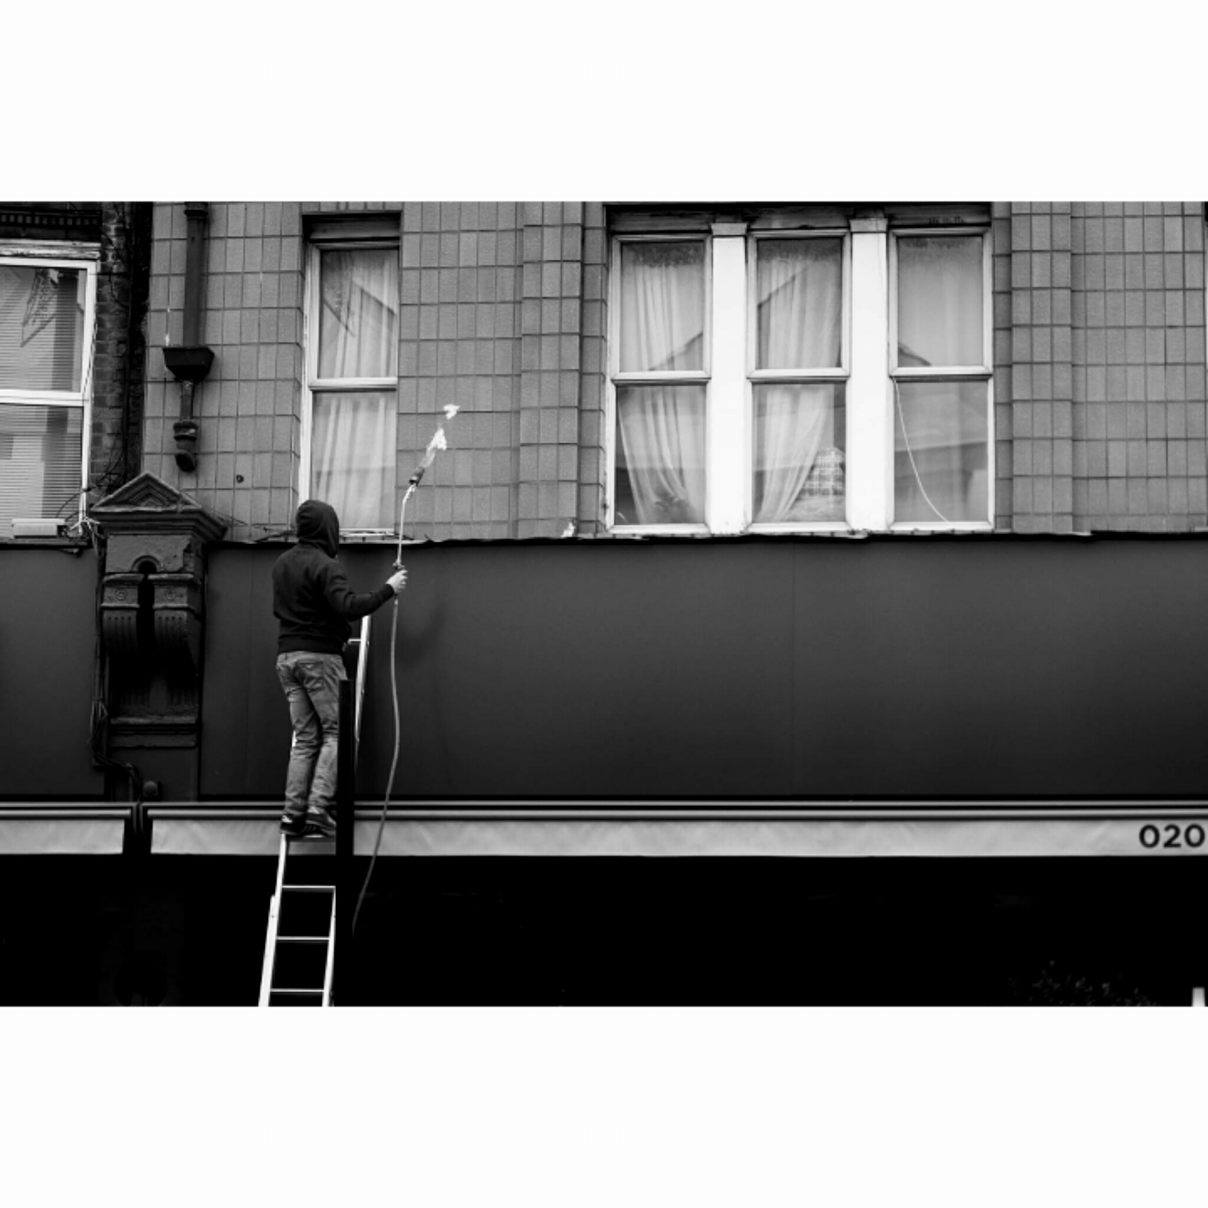 Fire man, London - January 2017